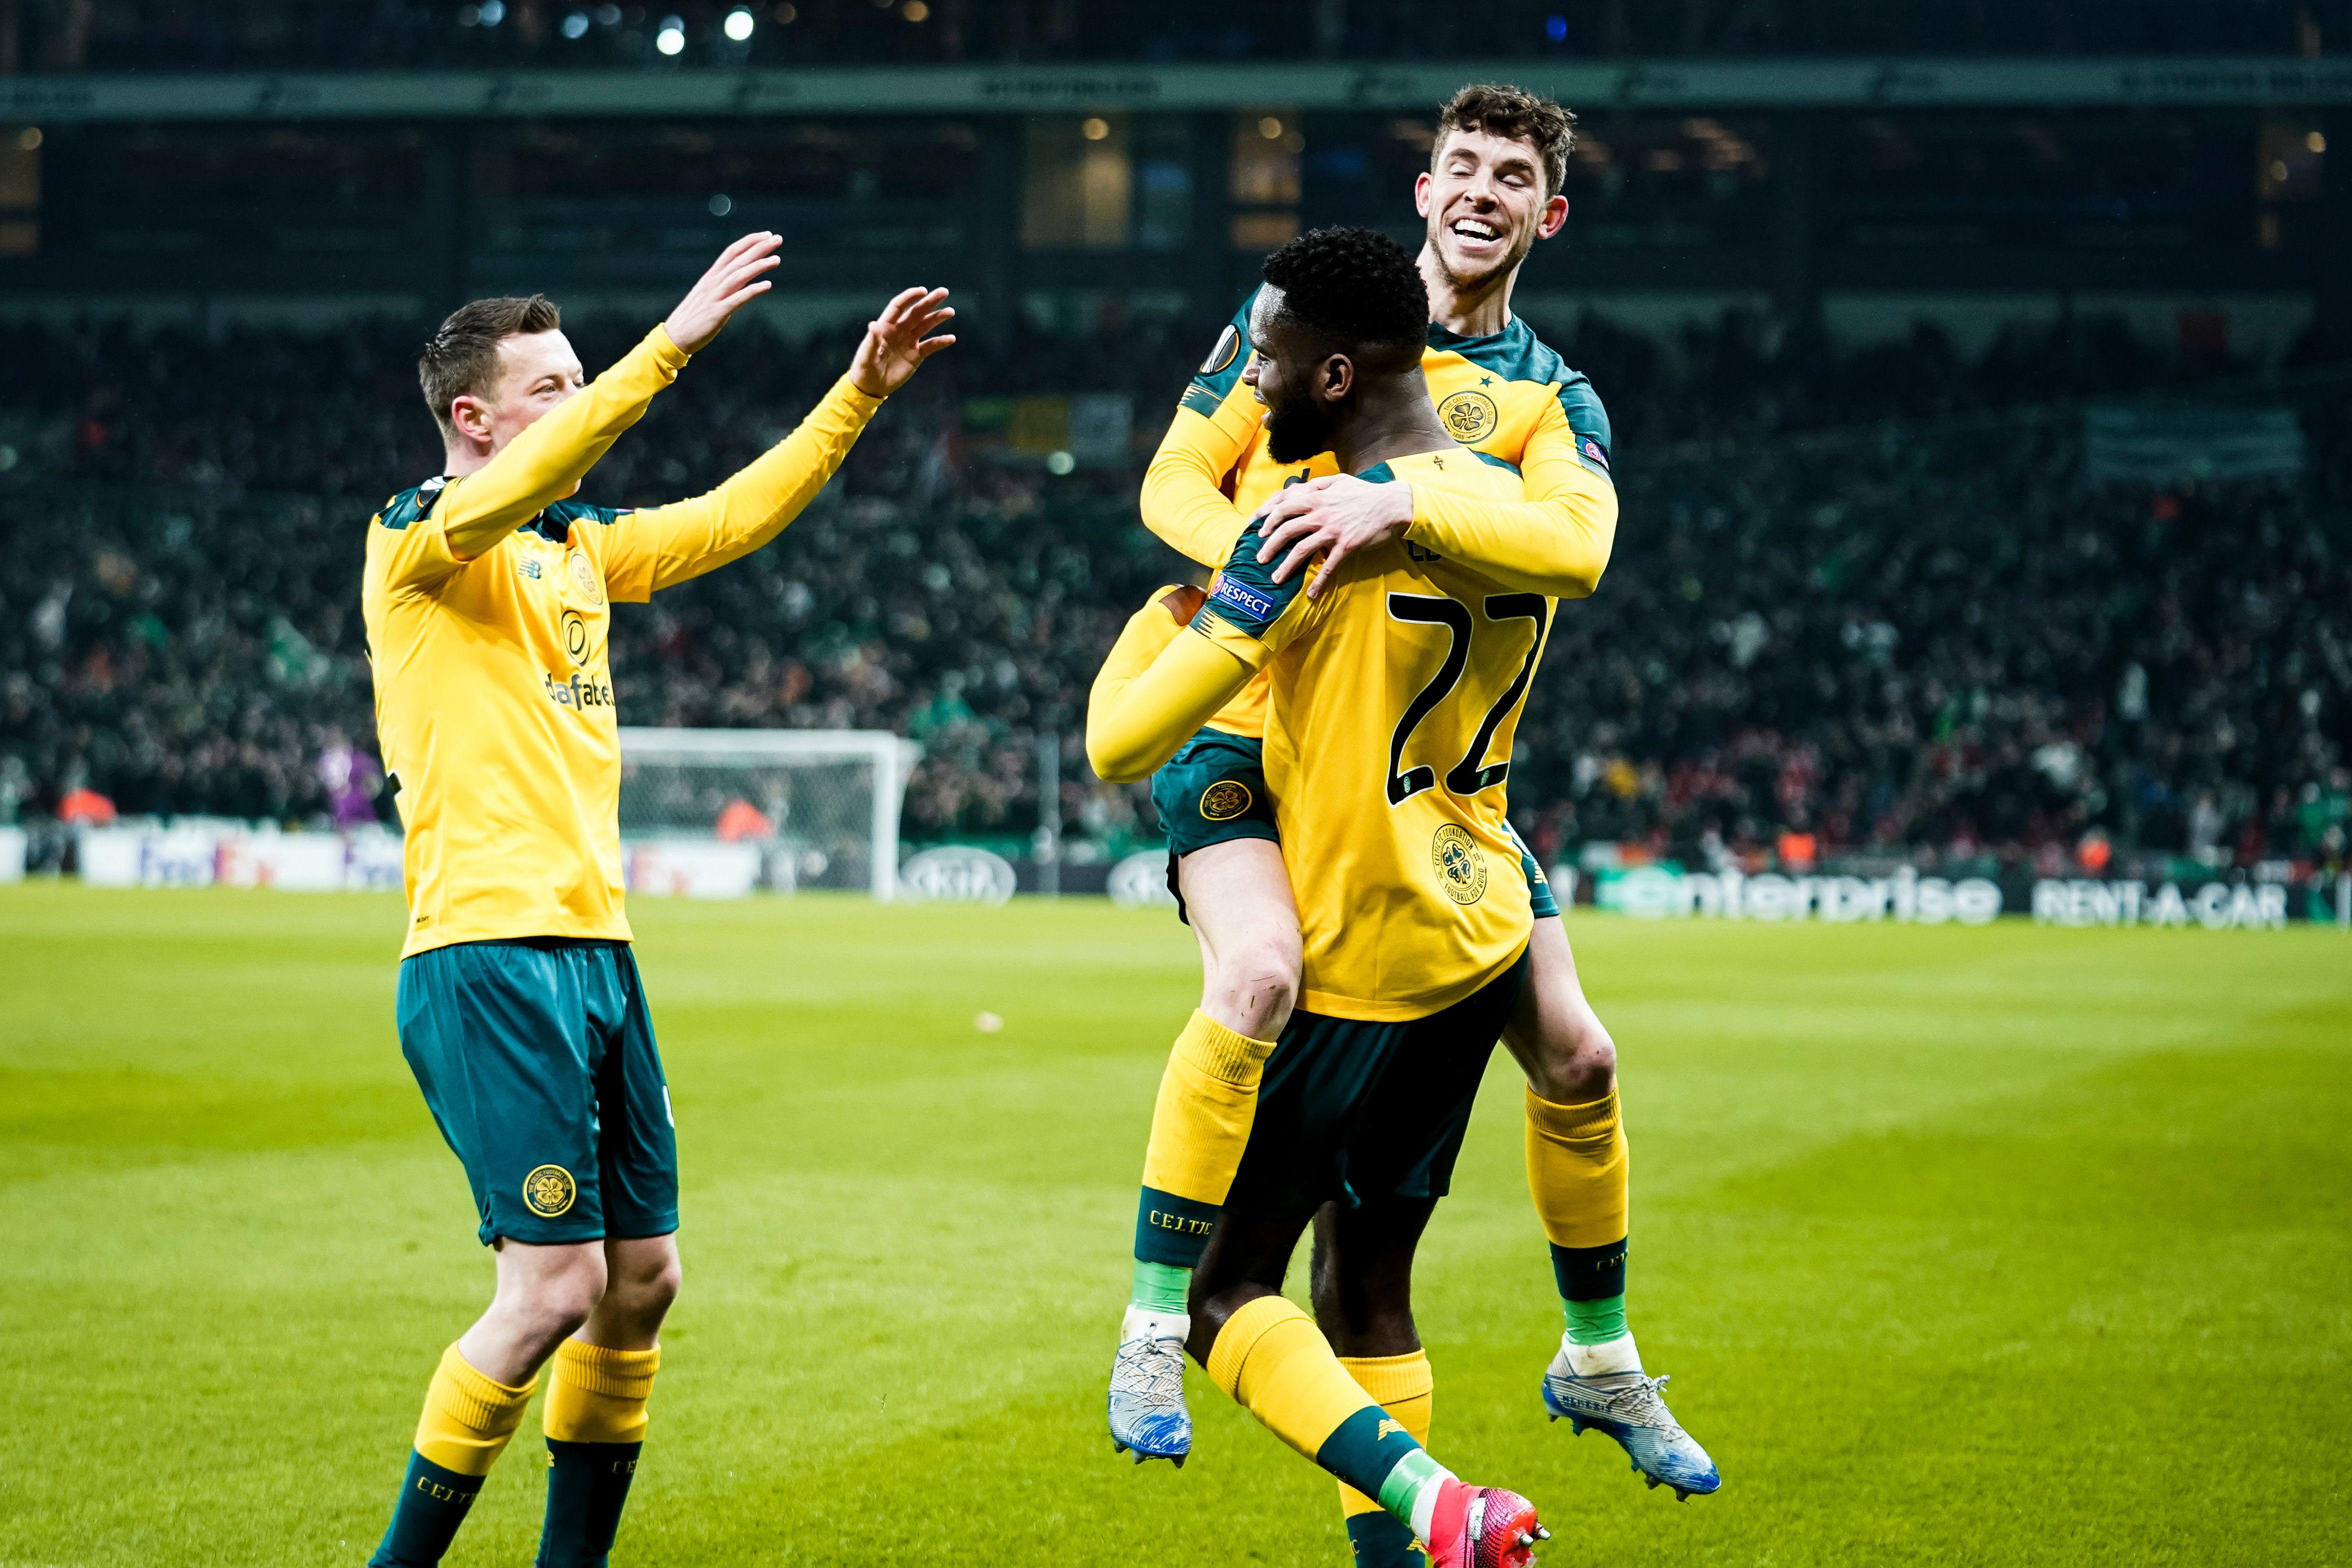 Celtic vs Copenhagen FREE Live stream, TV channel, kick